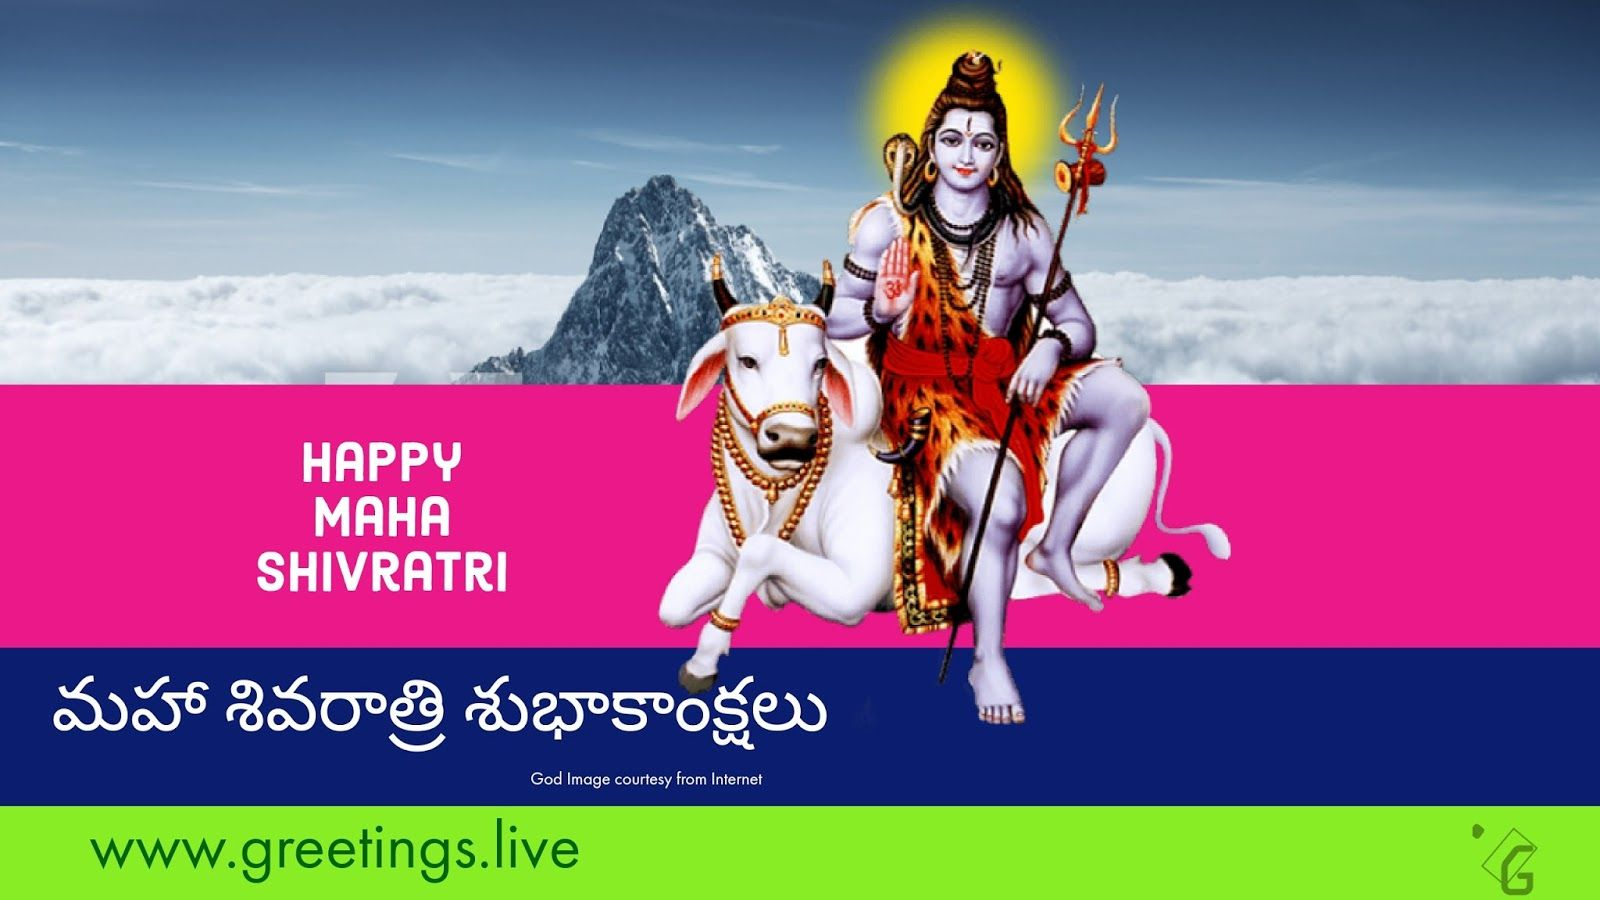 Happy maha shivratri festival 2018 wishes in telugu language telugu festival greetings devotional greetings in telugu happy maha shivratri festival 2018 wishes in telugu m4hsunfo